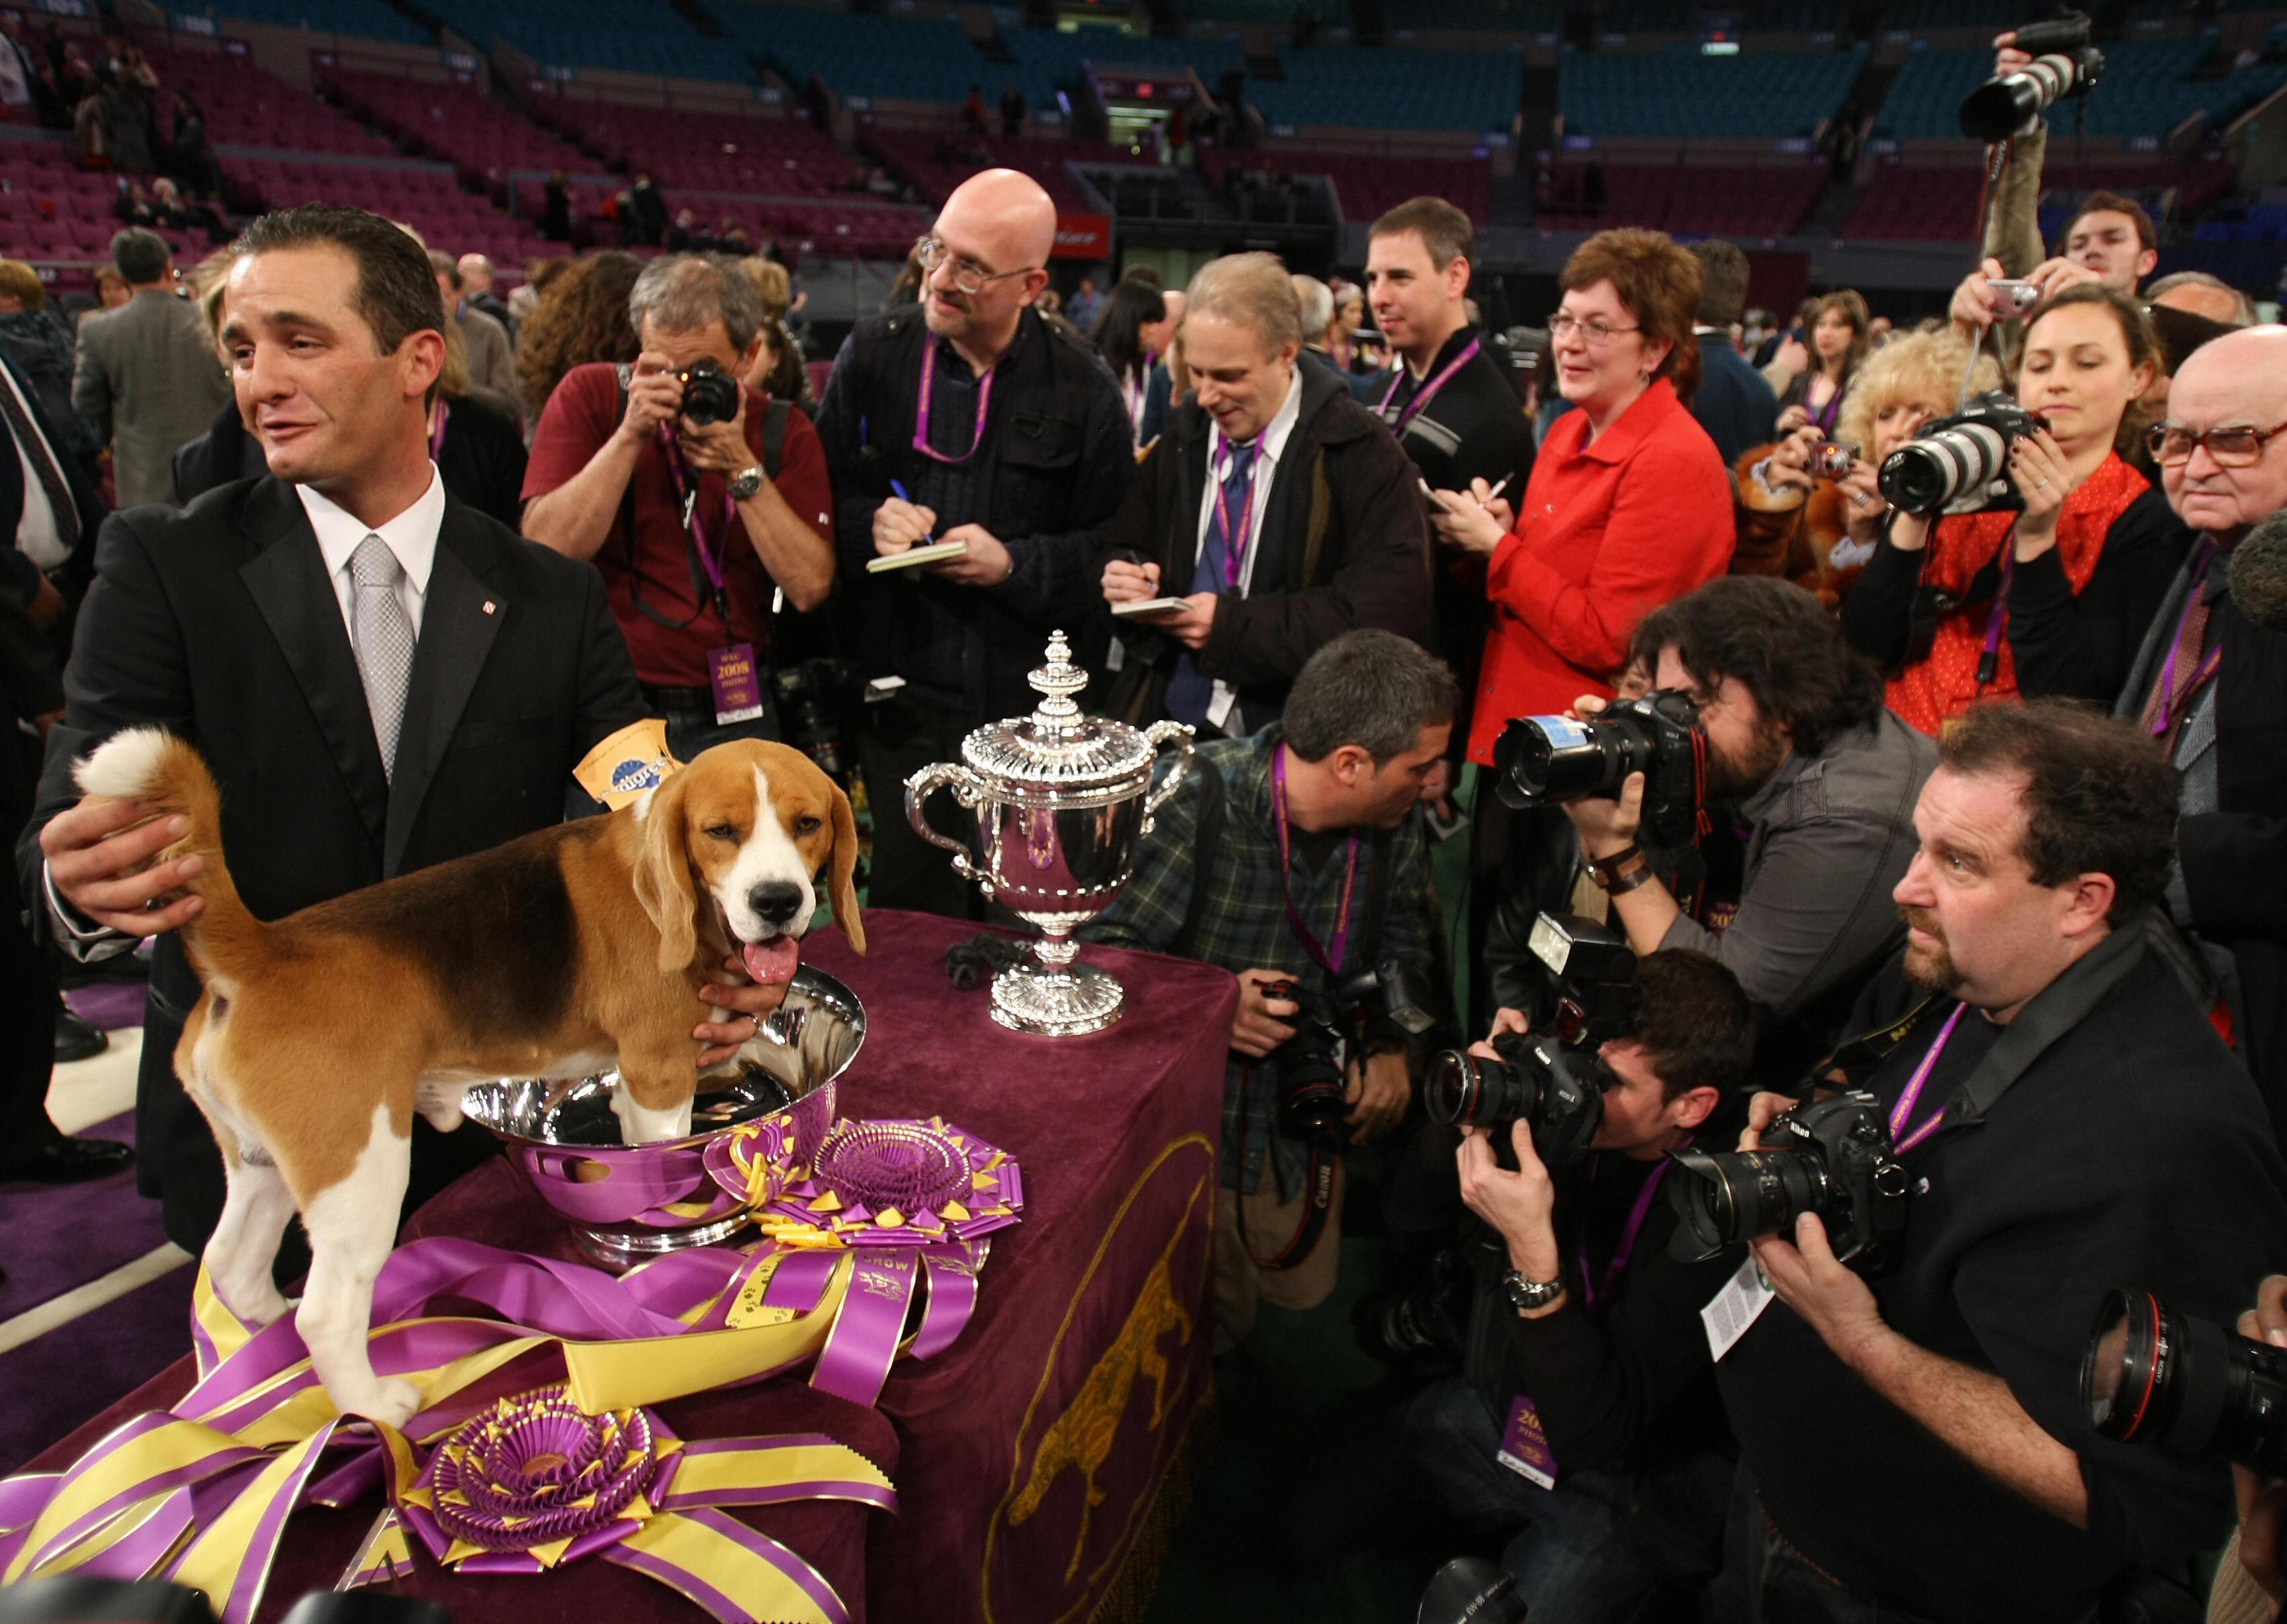 Super Cute Gallery: Big Beagle Being the Big Winner at Westminster!